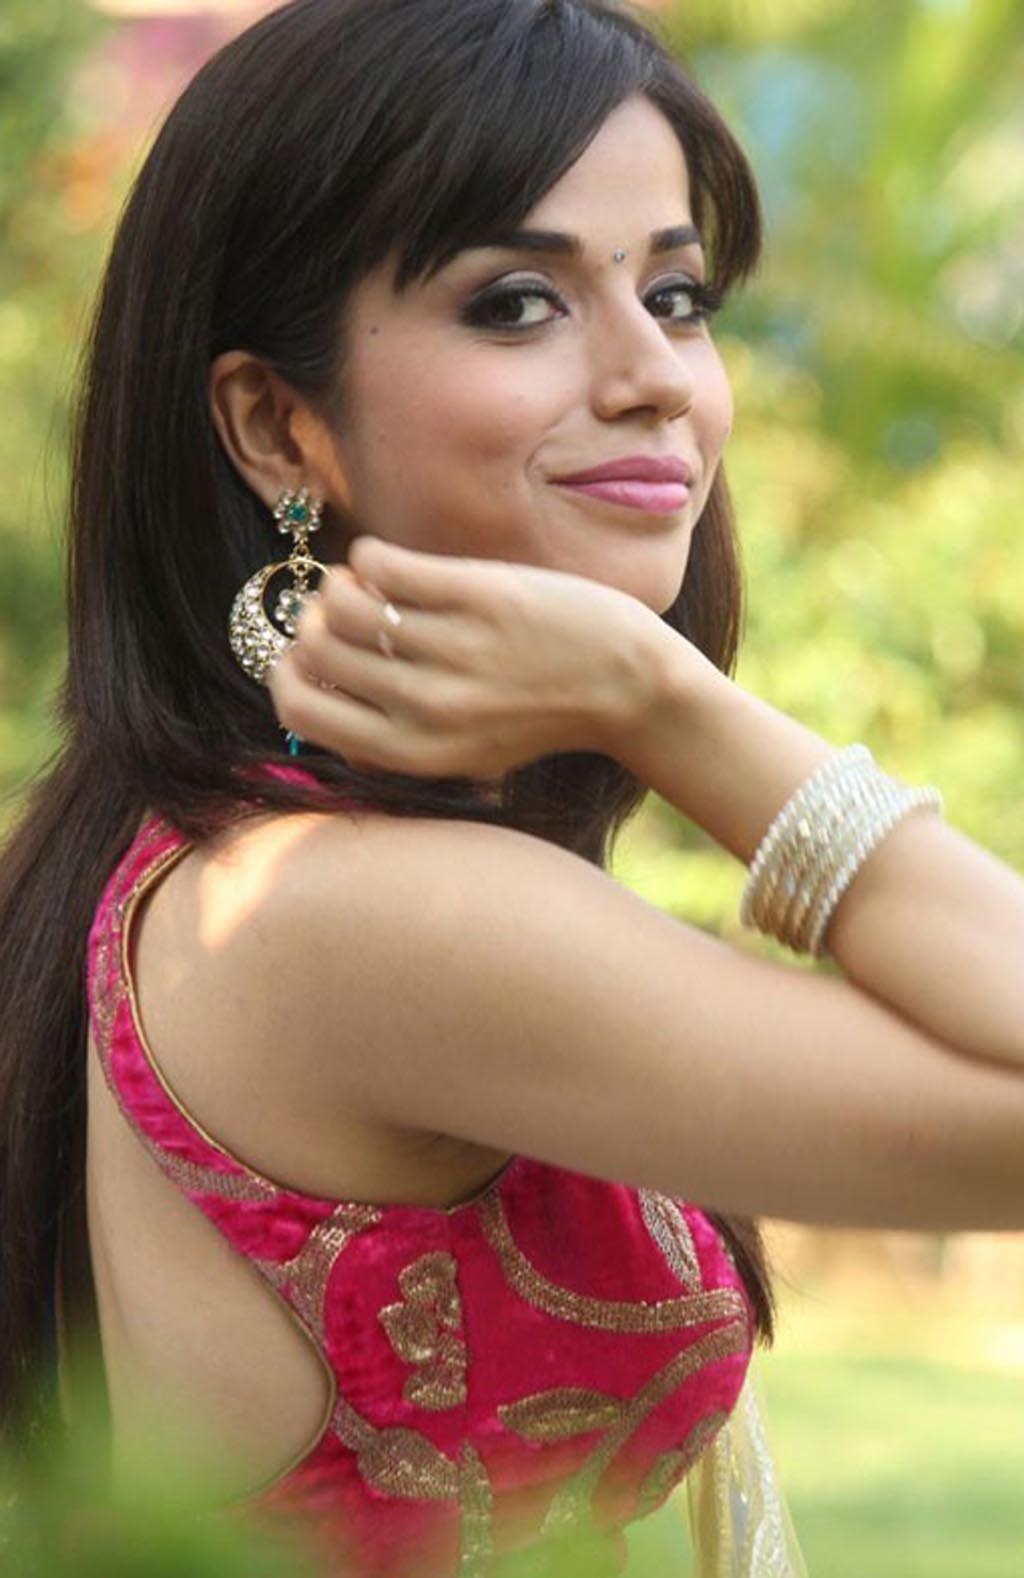 Aparnaa bajpai backless photos